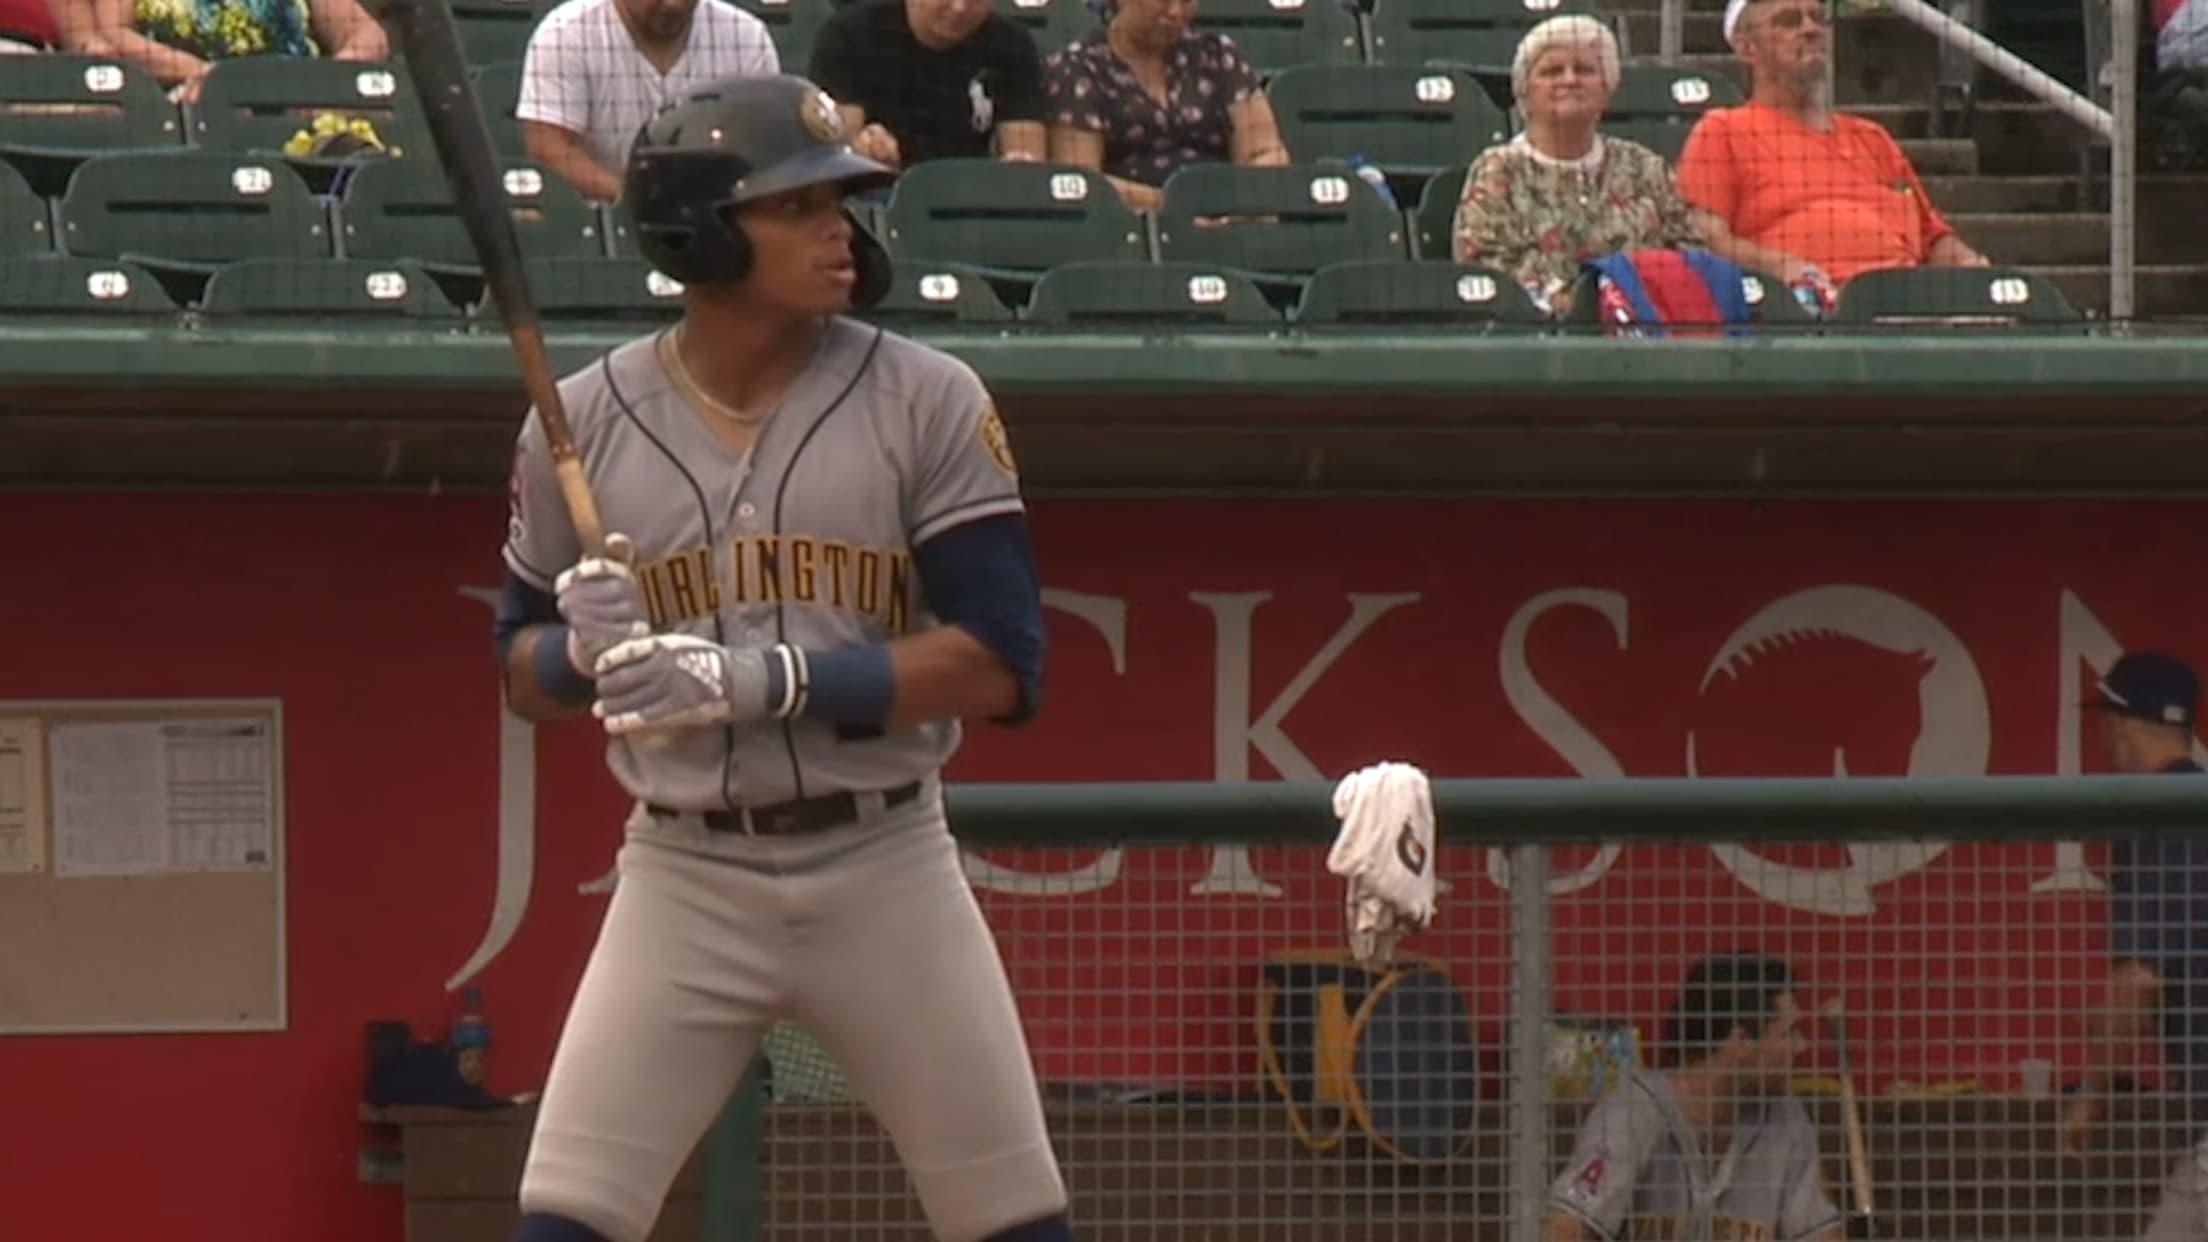 Top Prospects: Adams, LAA